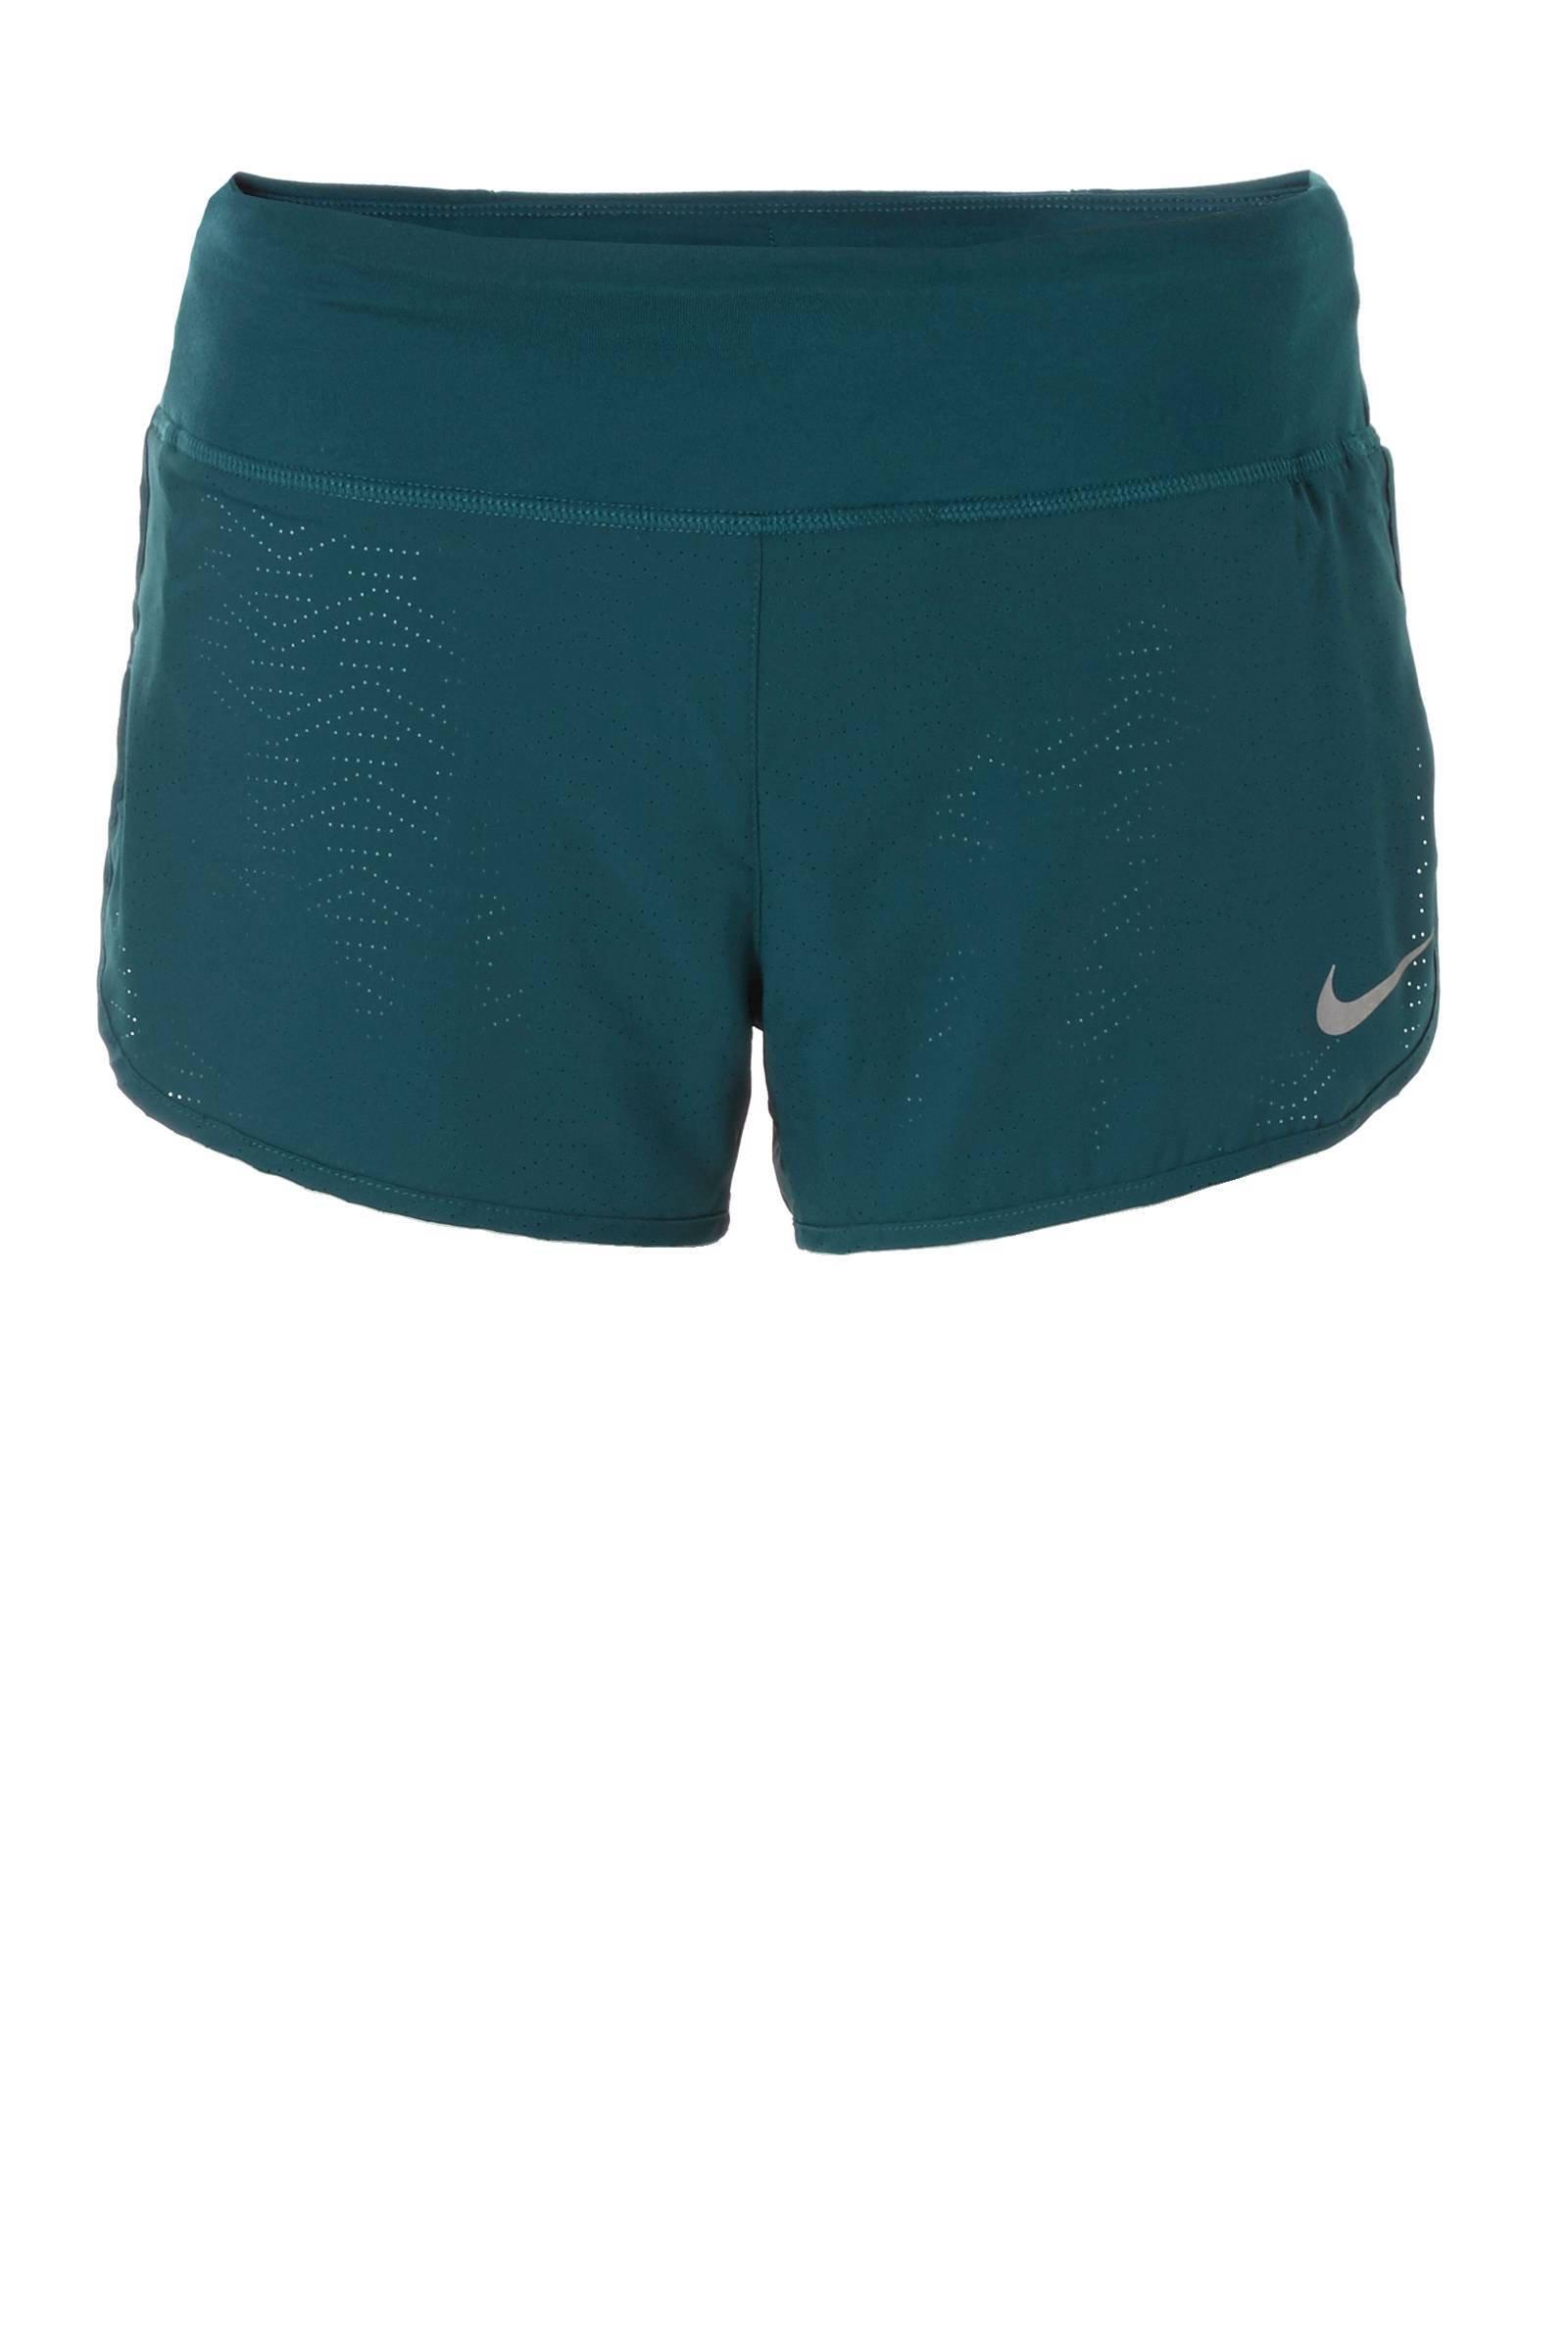 Nike hardloopshort grijs | wehkamp